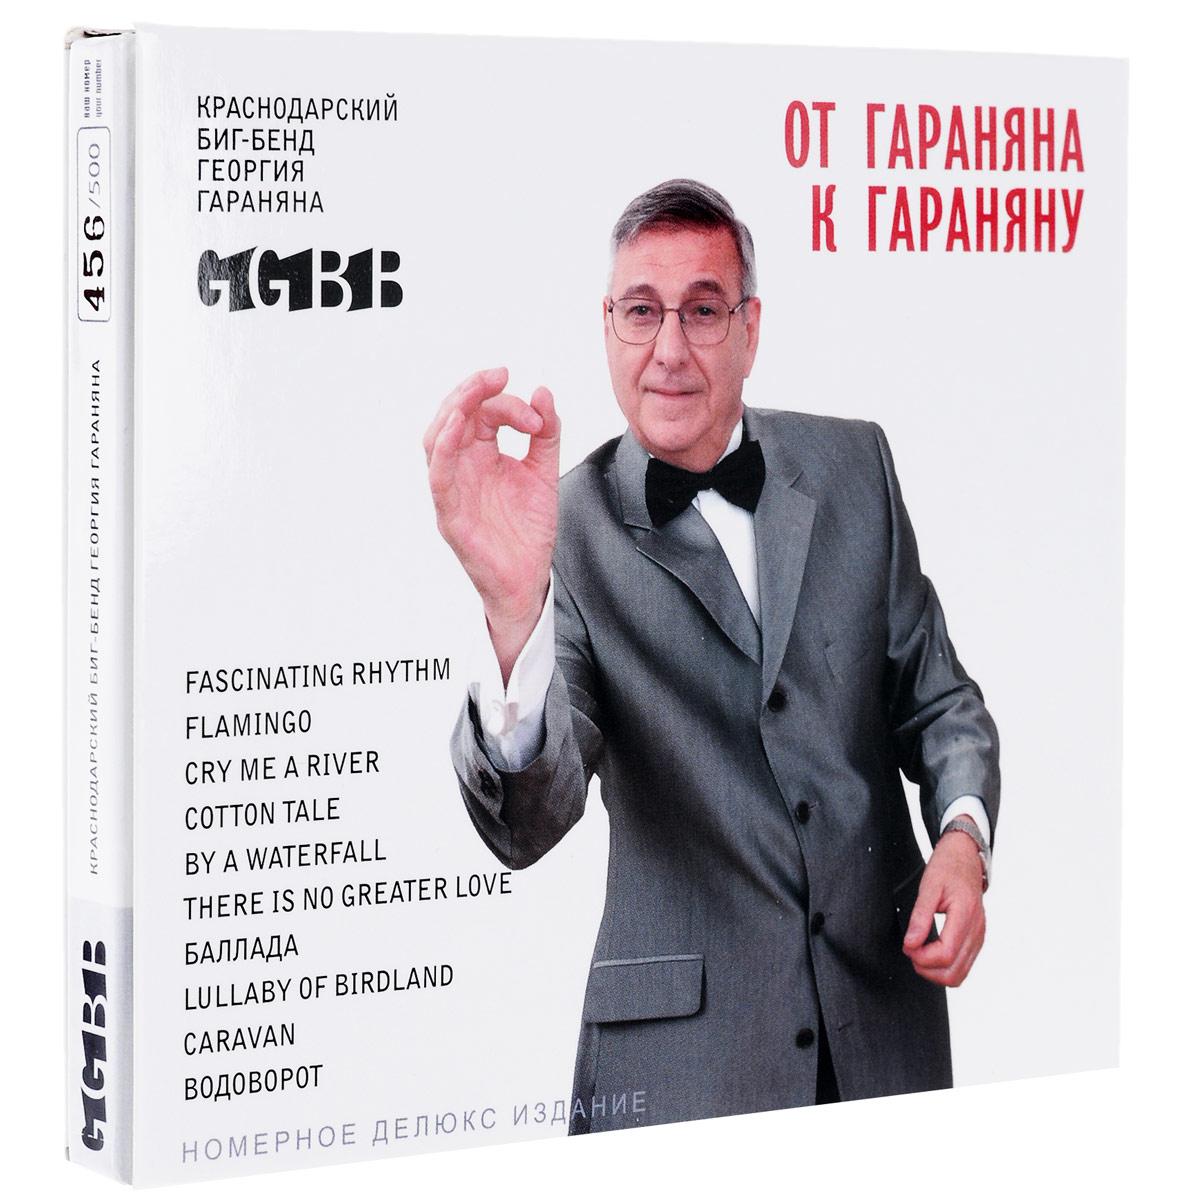 биг-бенд Георгия Гараняна биг-бенд Георгия Гараняна. От Гараняна к Гараняну. Deluxe Edition